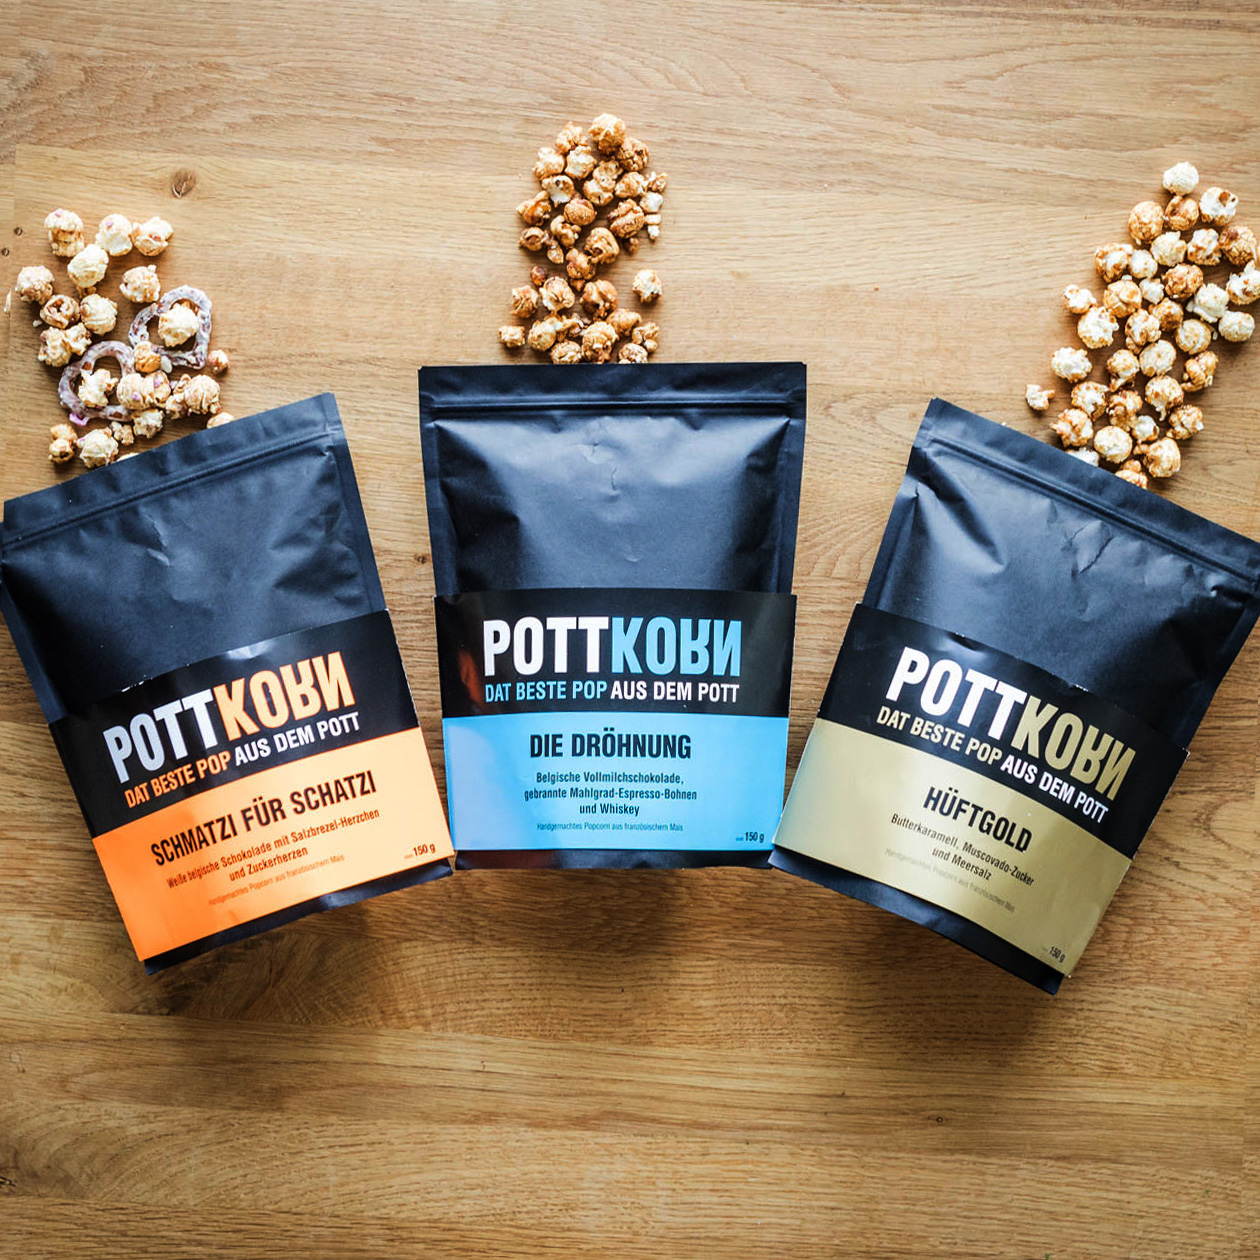 Pottkorn - Spezial Popcorn - Grillgemüse